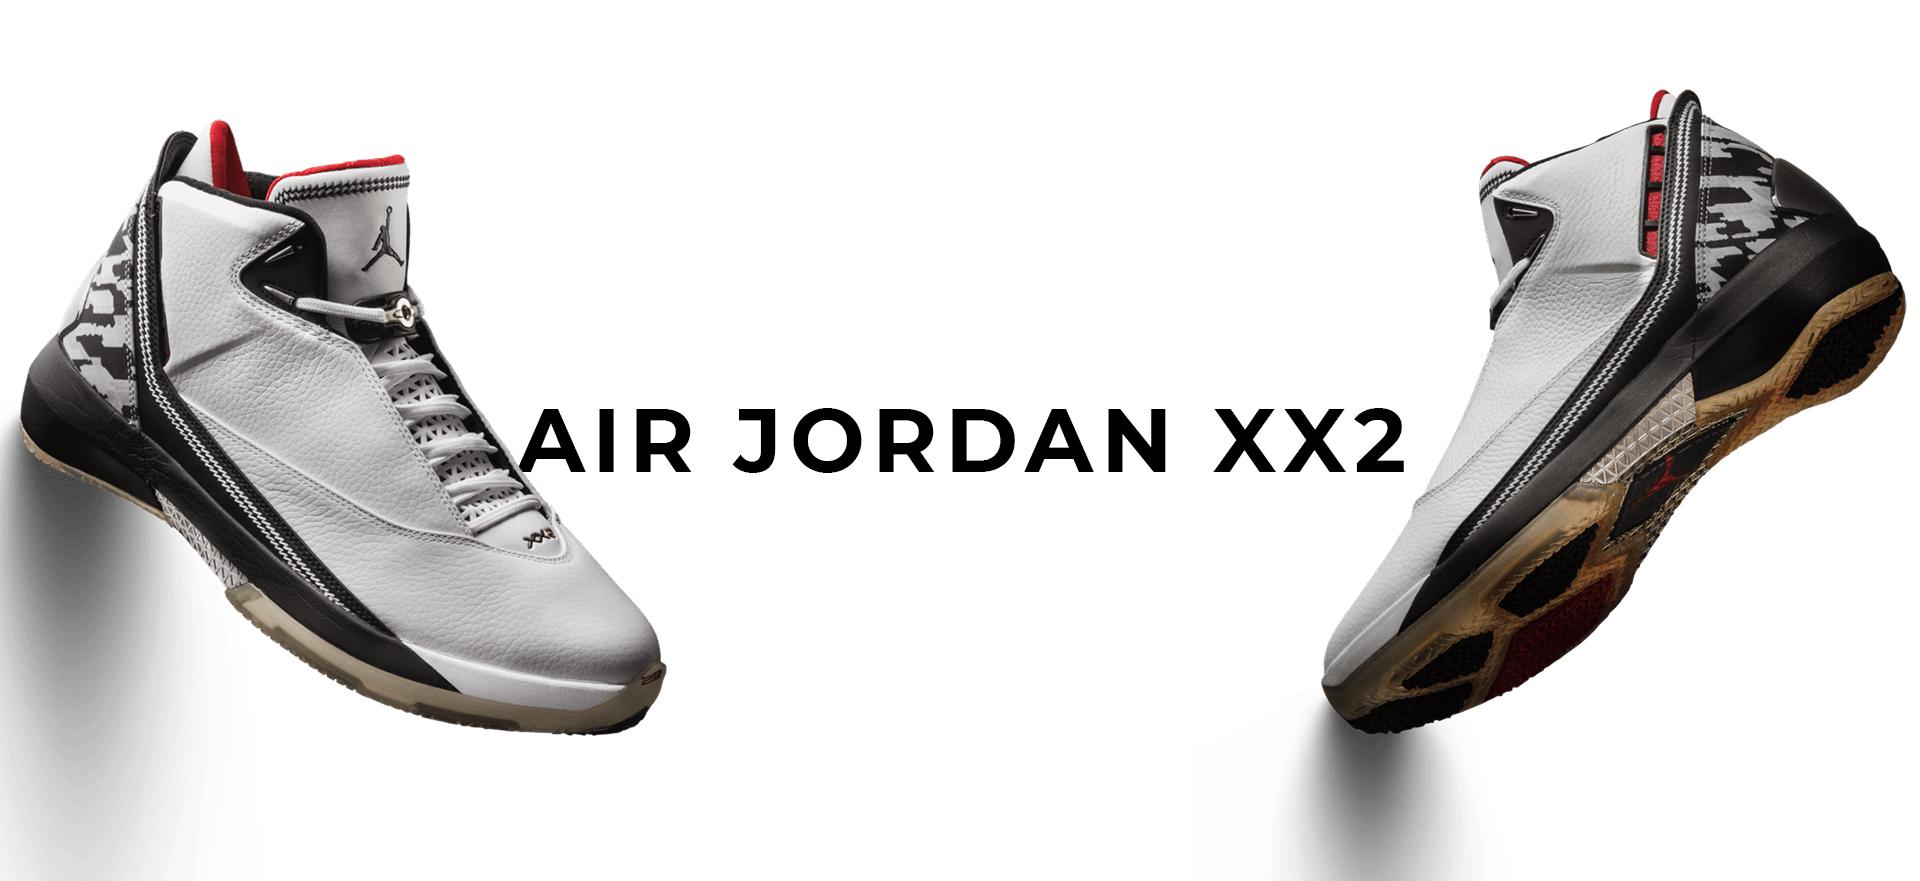 Air Jordan 22 — mcmag.ru — все модели джордан